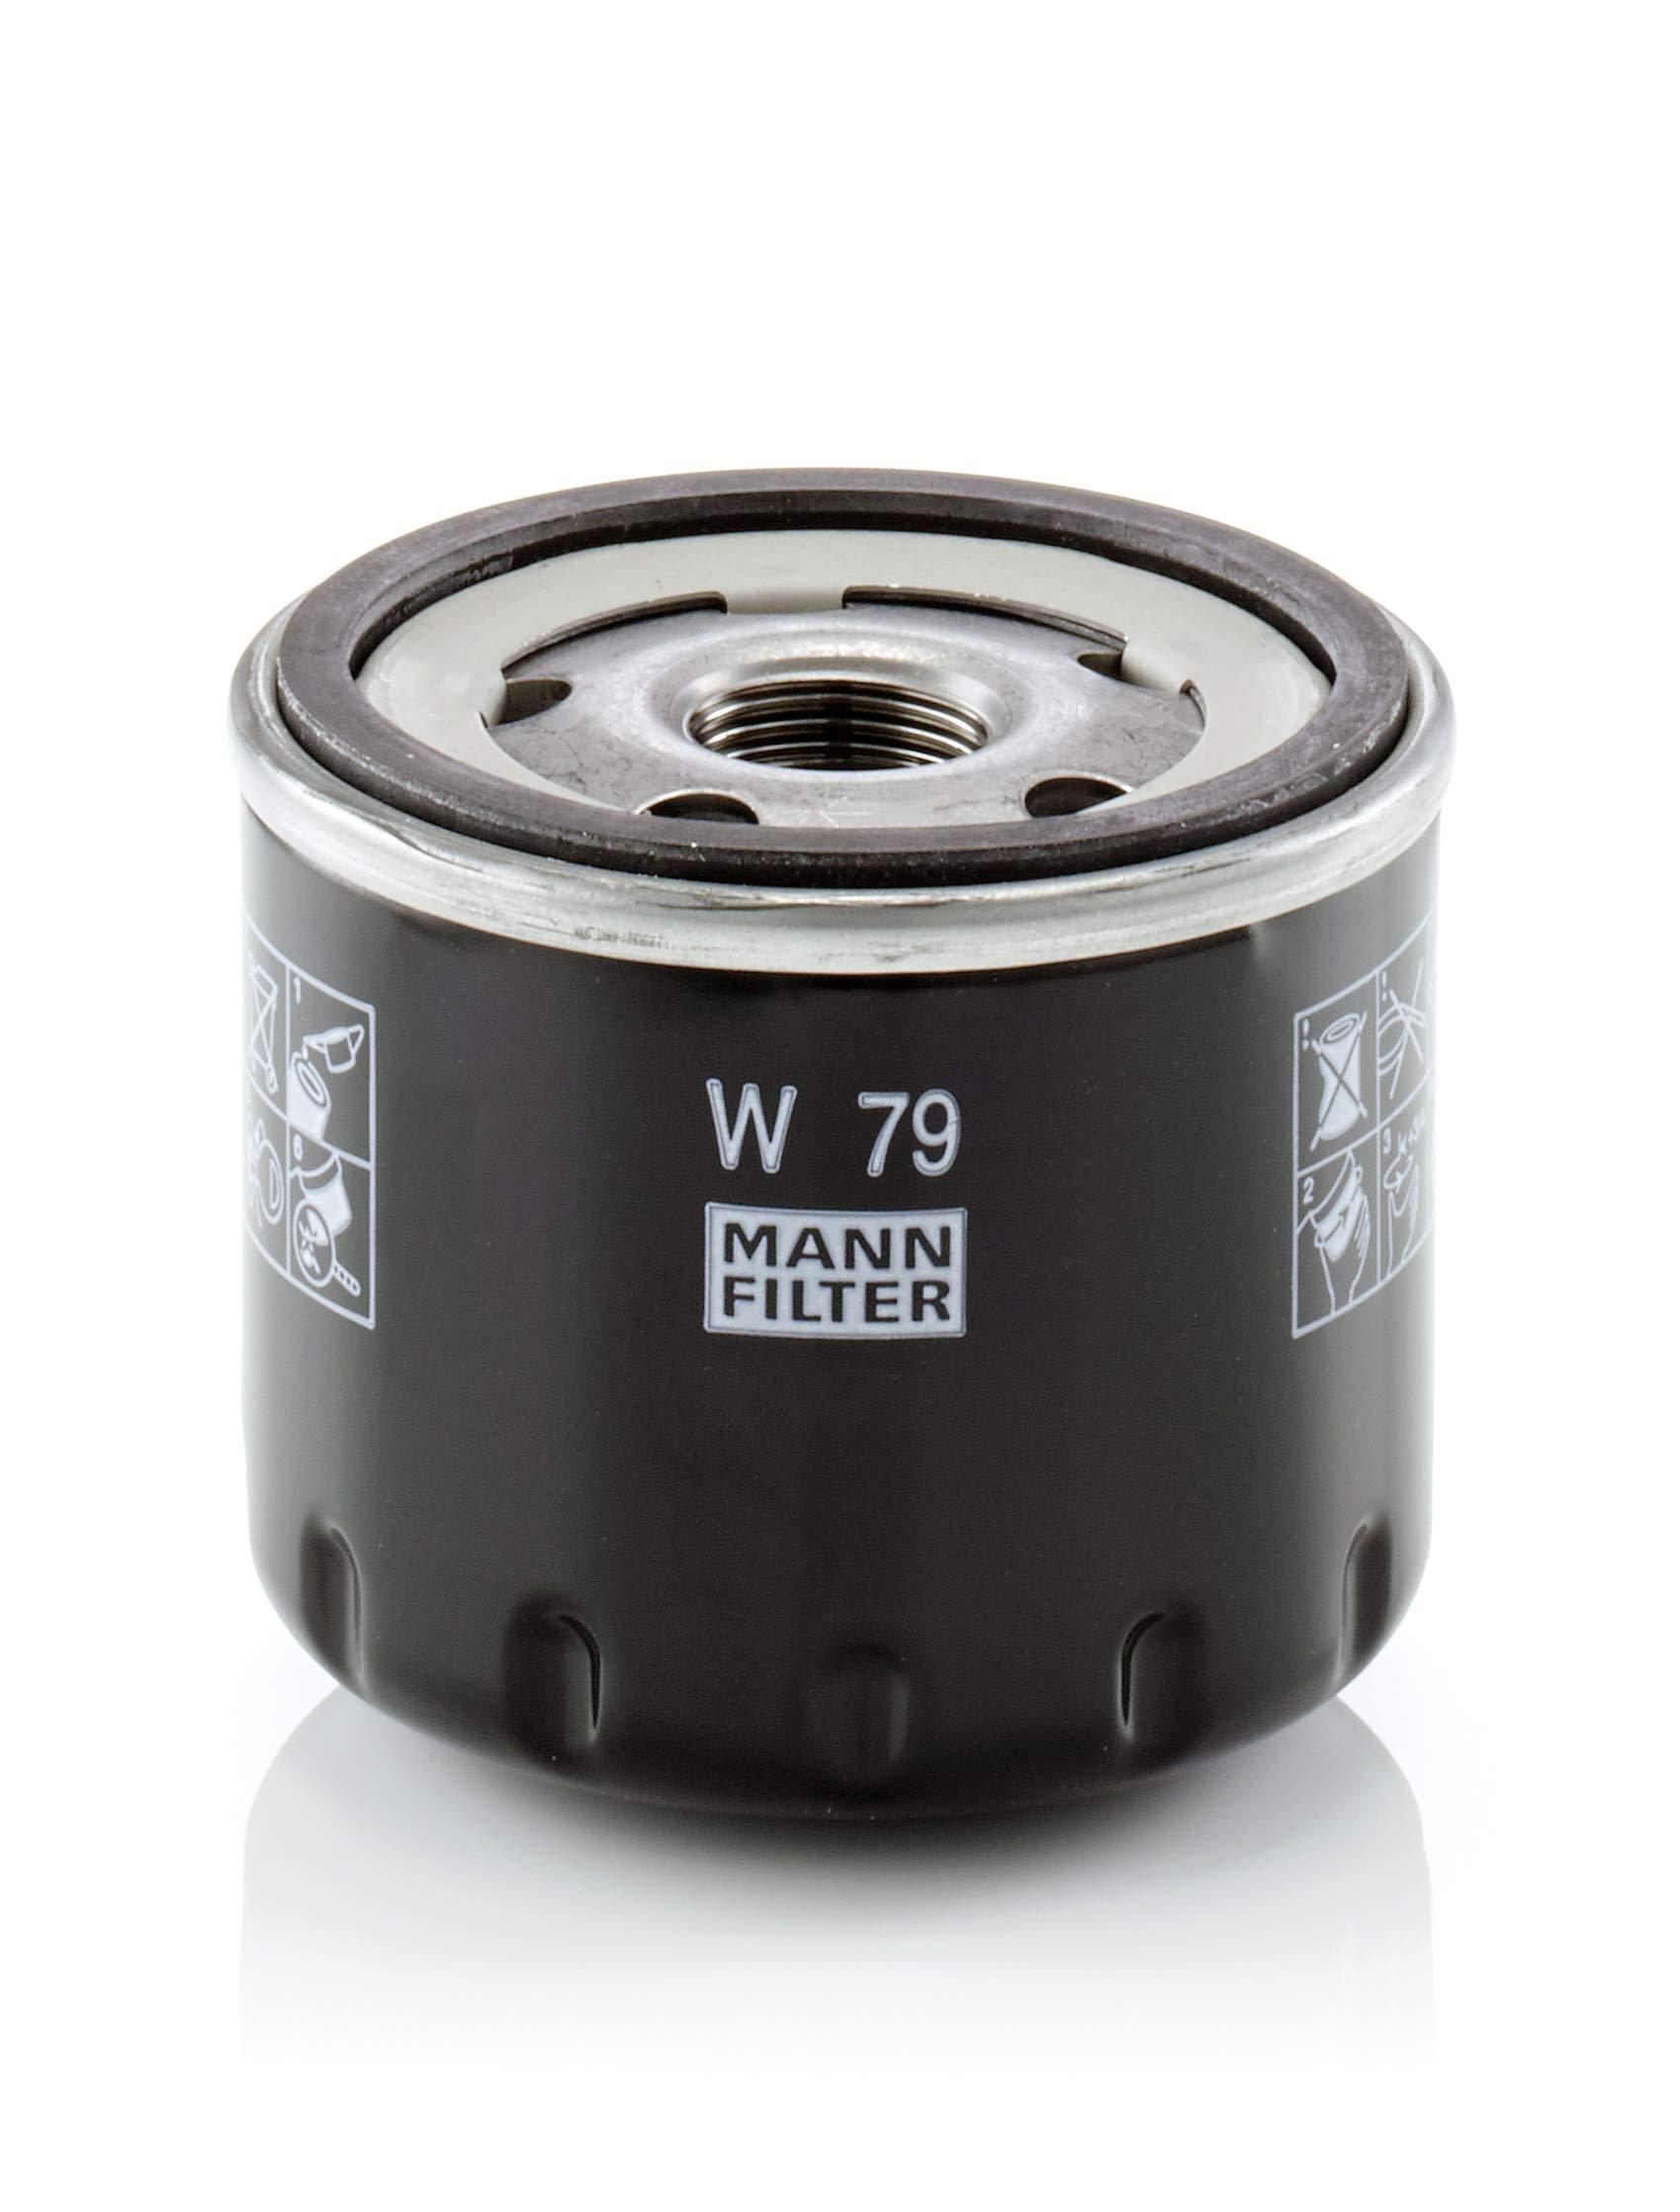 MANN-FILTER Original Filtro de Aceite W 79 – Para automóviles product image